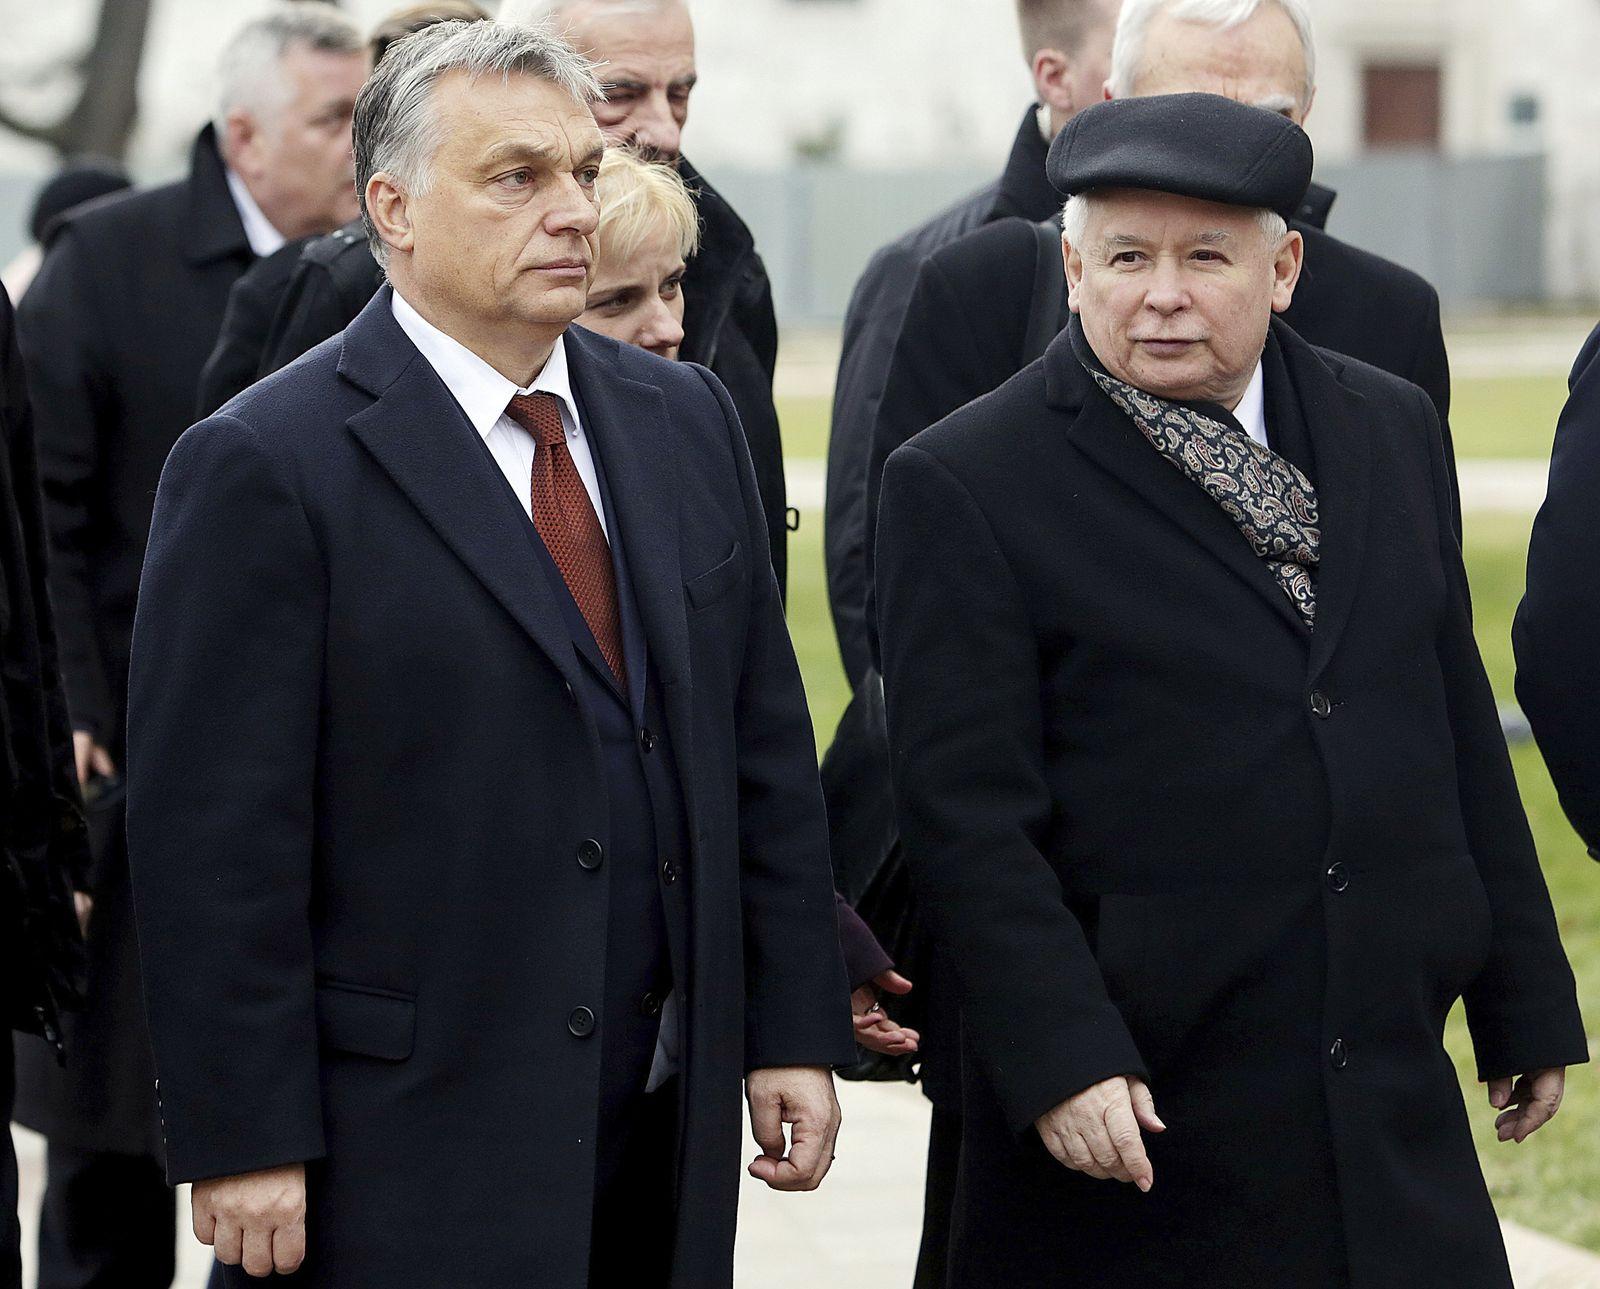 Viktor Orban/ Jaroslaw Kaczynski